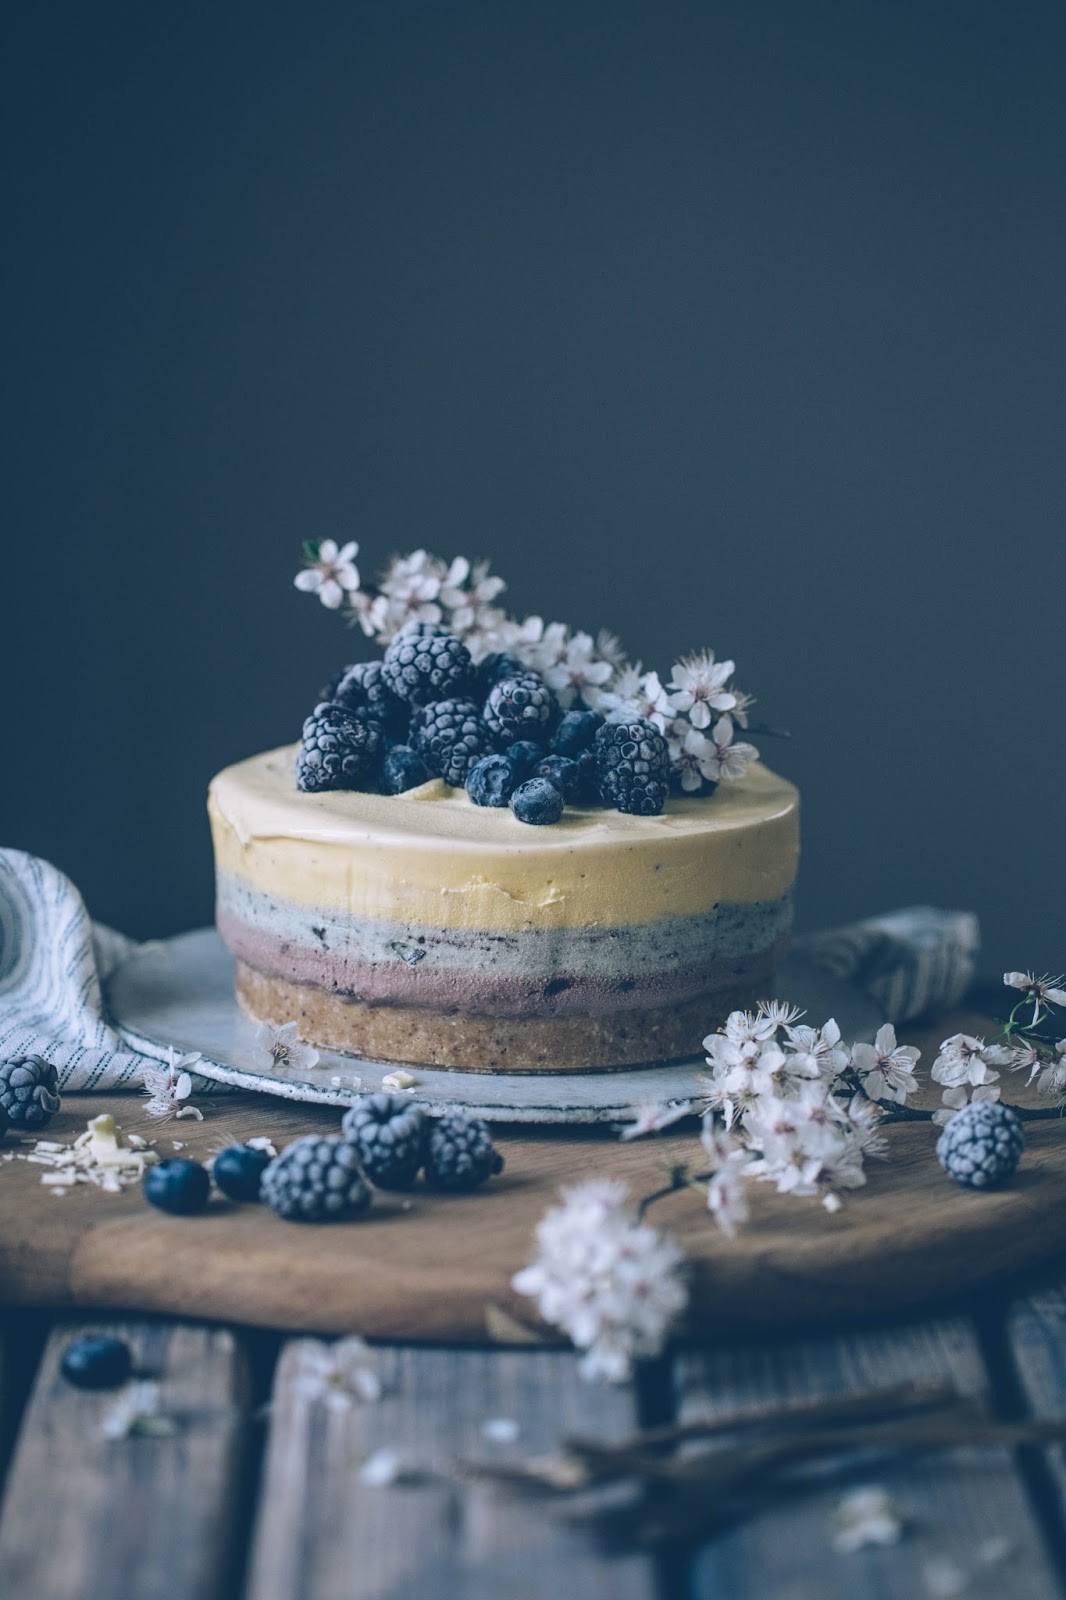 Lactose-free Mint-Chocolate-Vanilla-Ice-Cream Cake